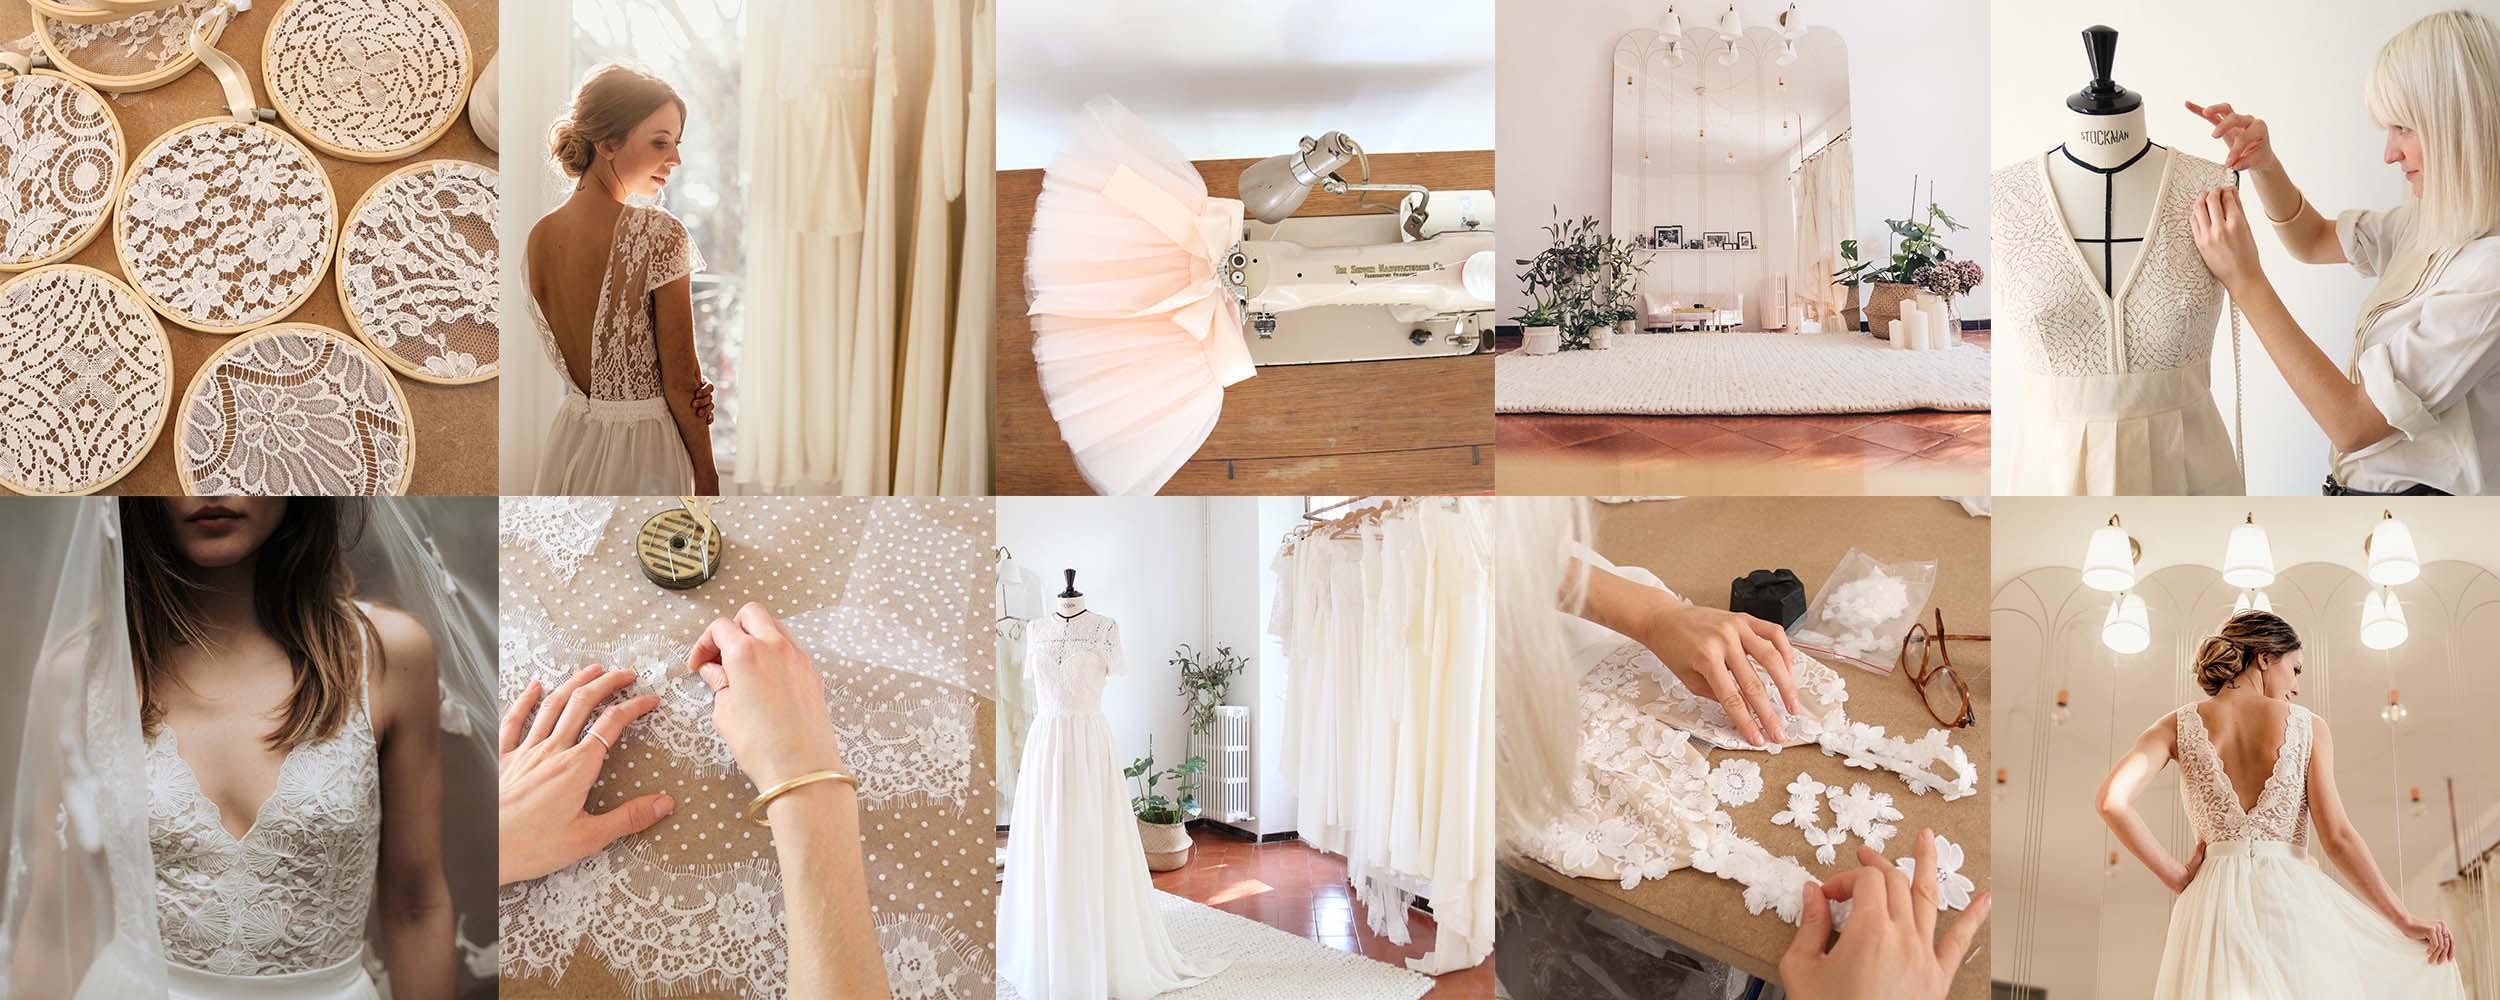 Robe de mariee occasion montpellier